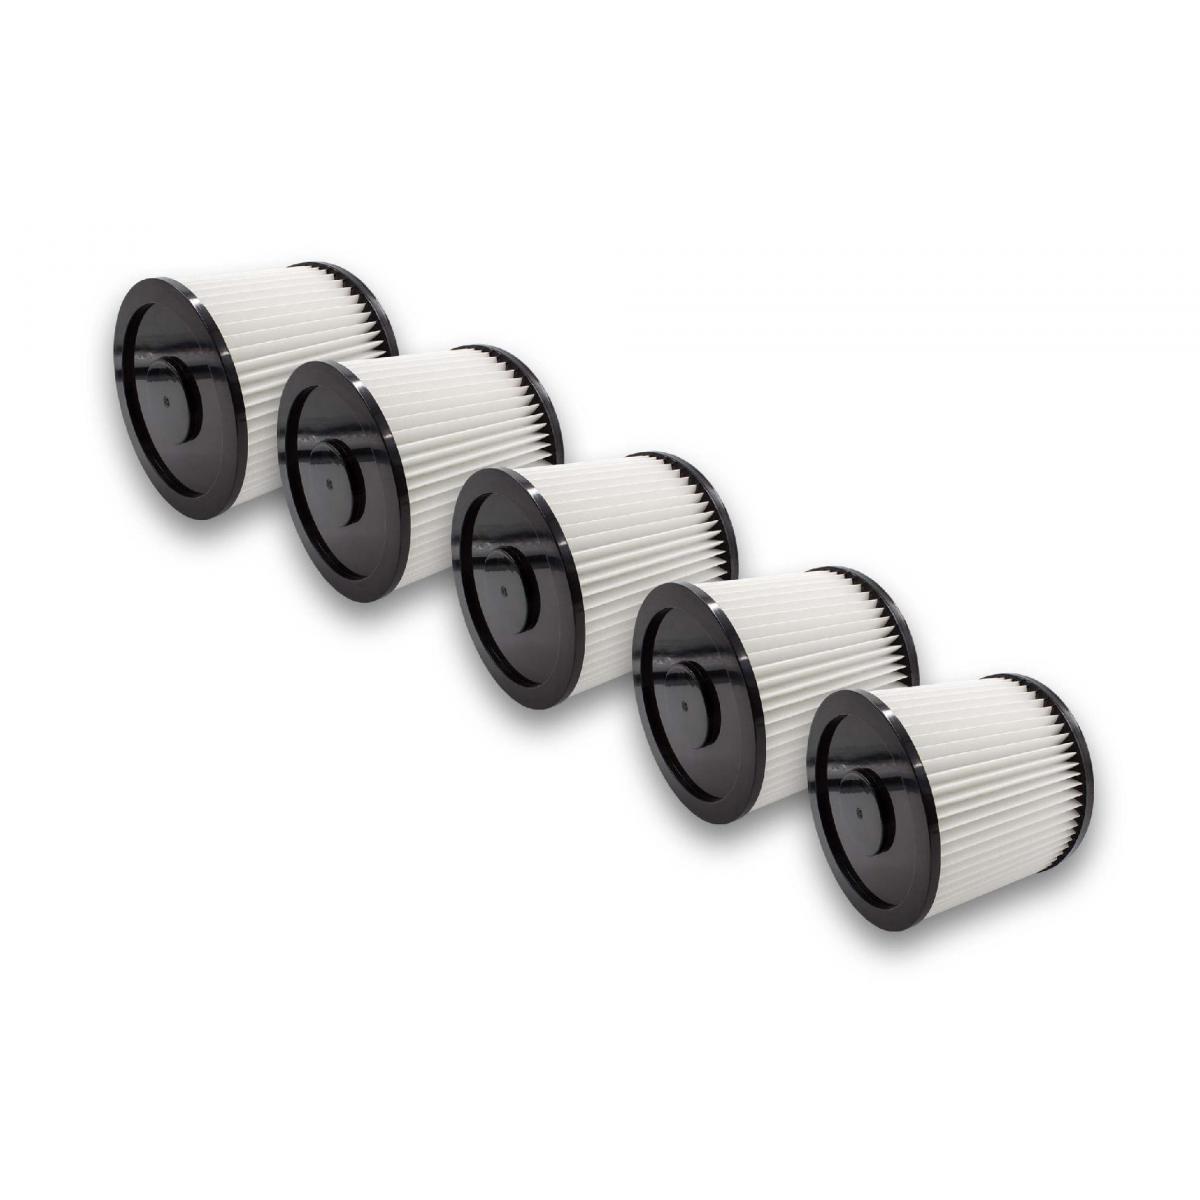 Vhbw vhbw 5x Filtres ronds pour aspirateur multifonctions Shop-Vac Super 615 S2, Super 760, Ultra 40 Blower